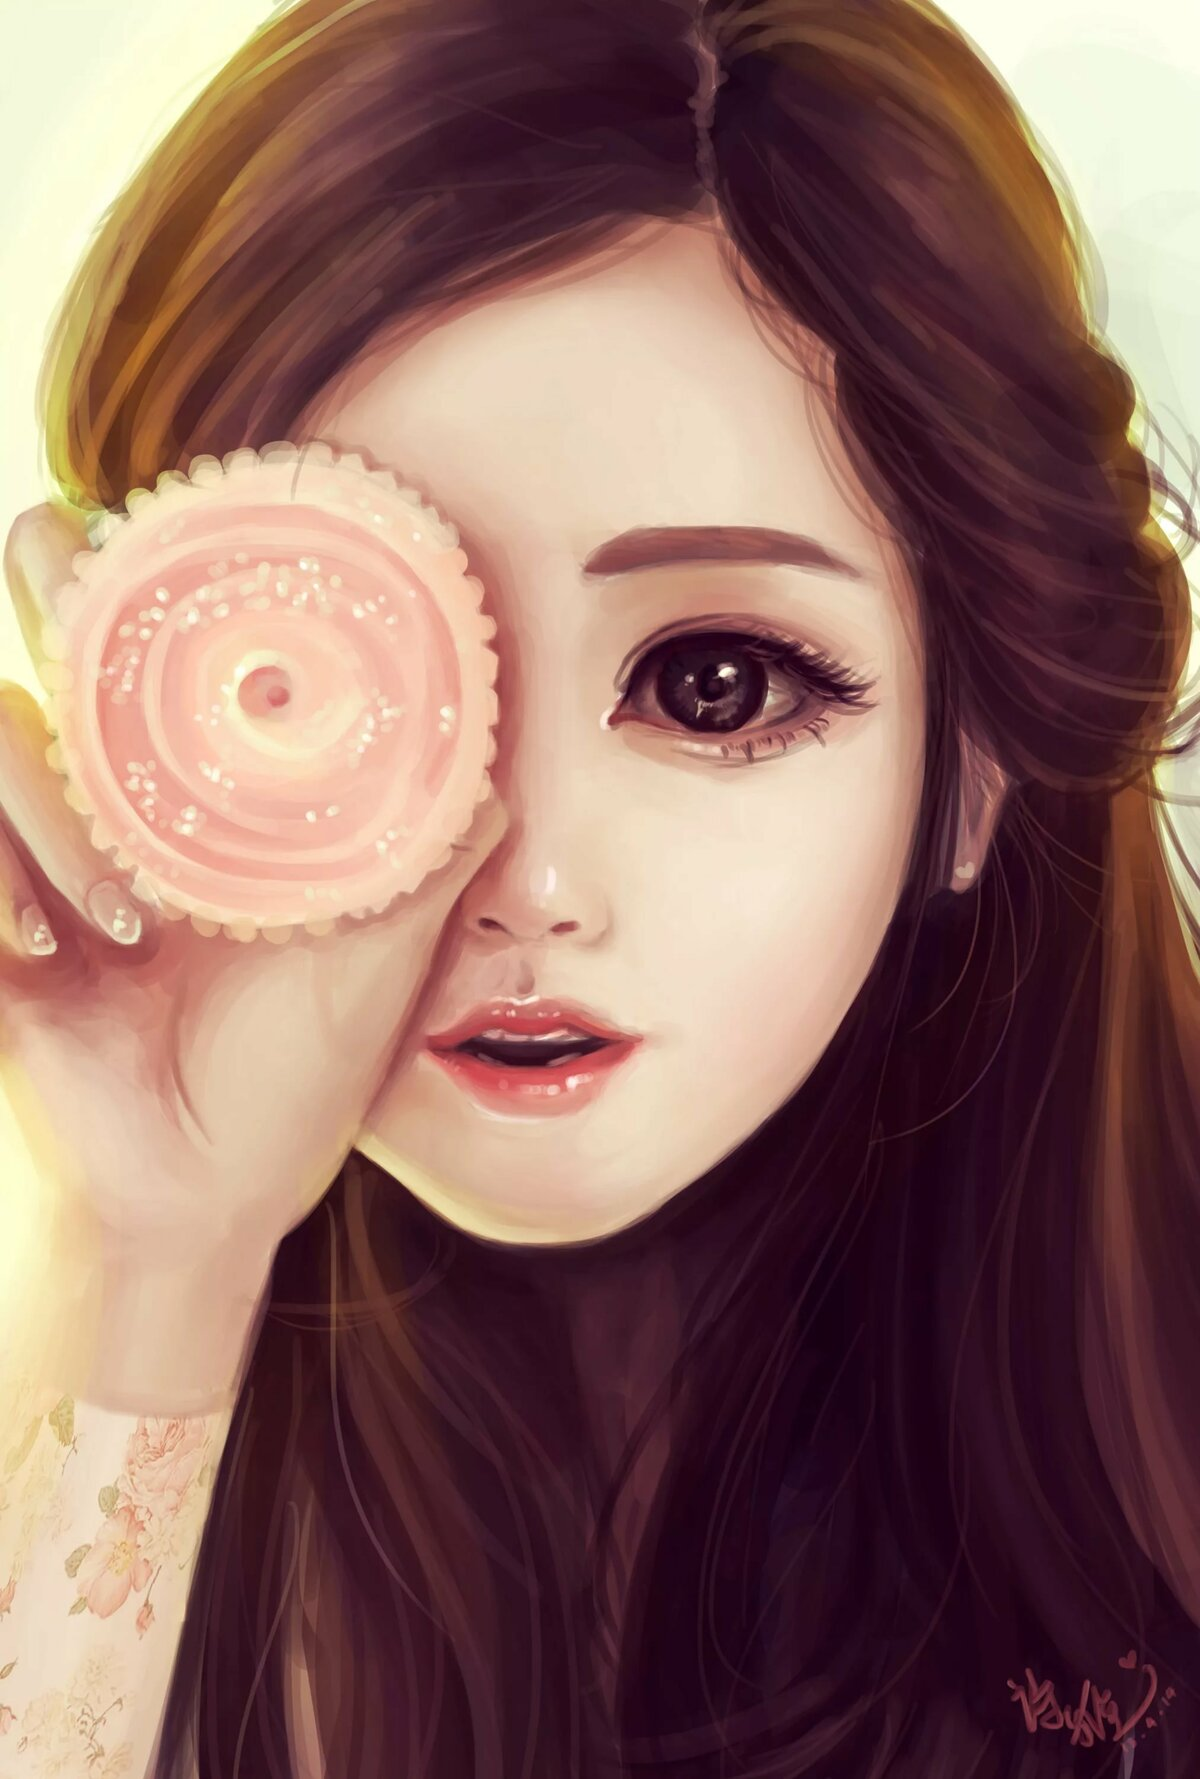 Картинки арт девочка